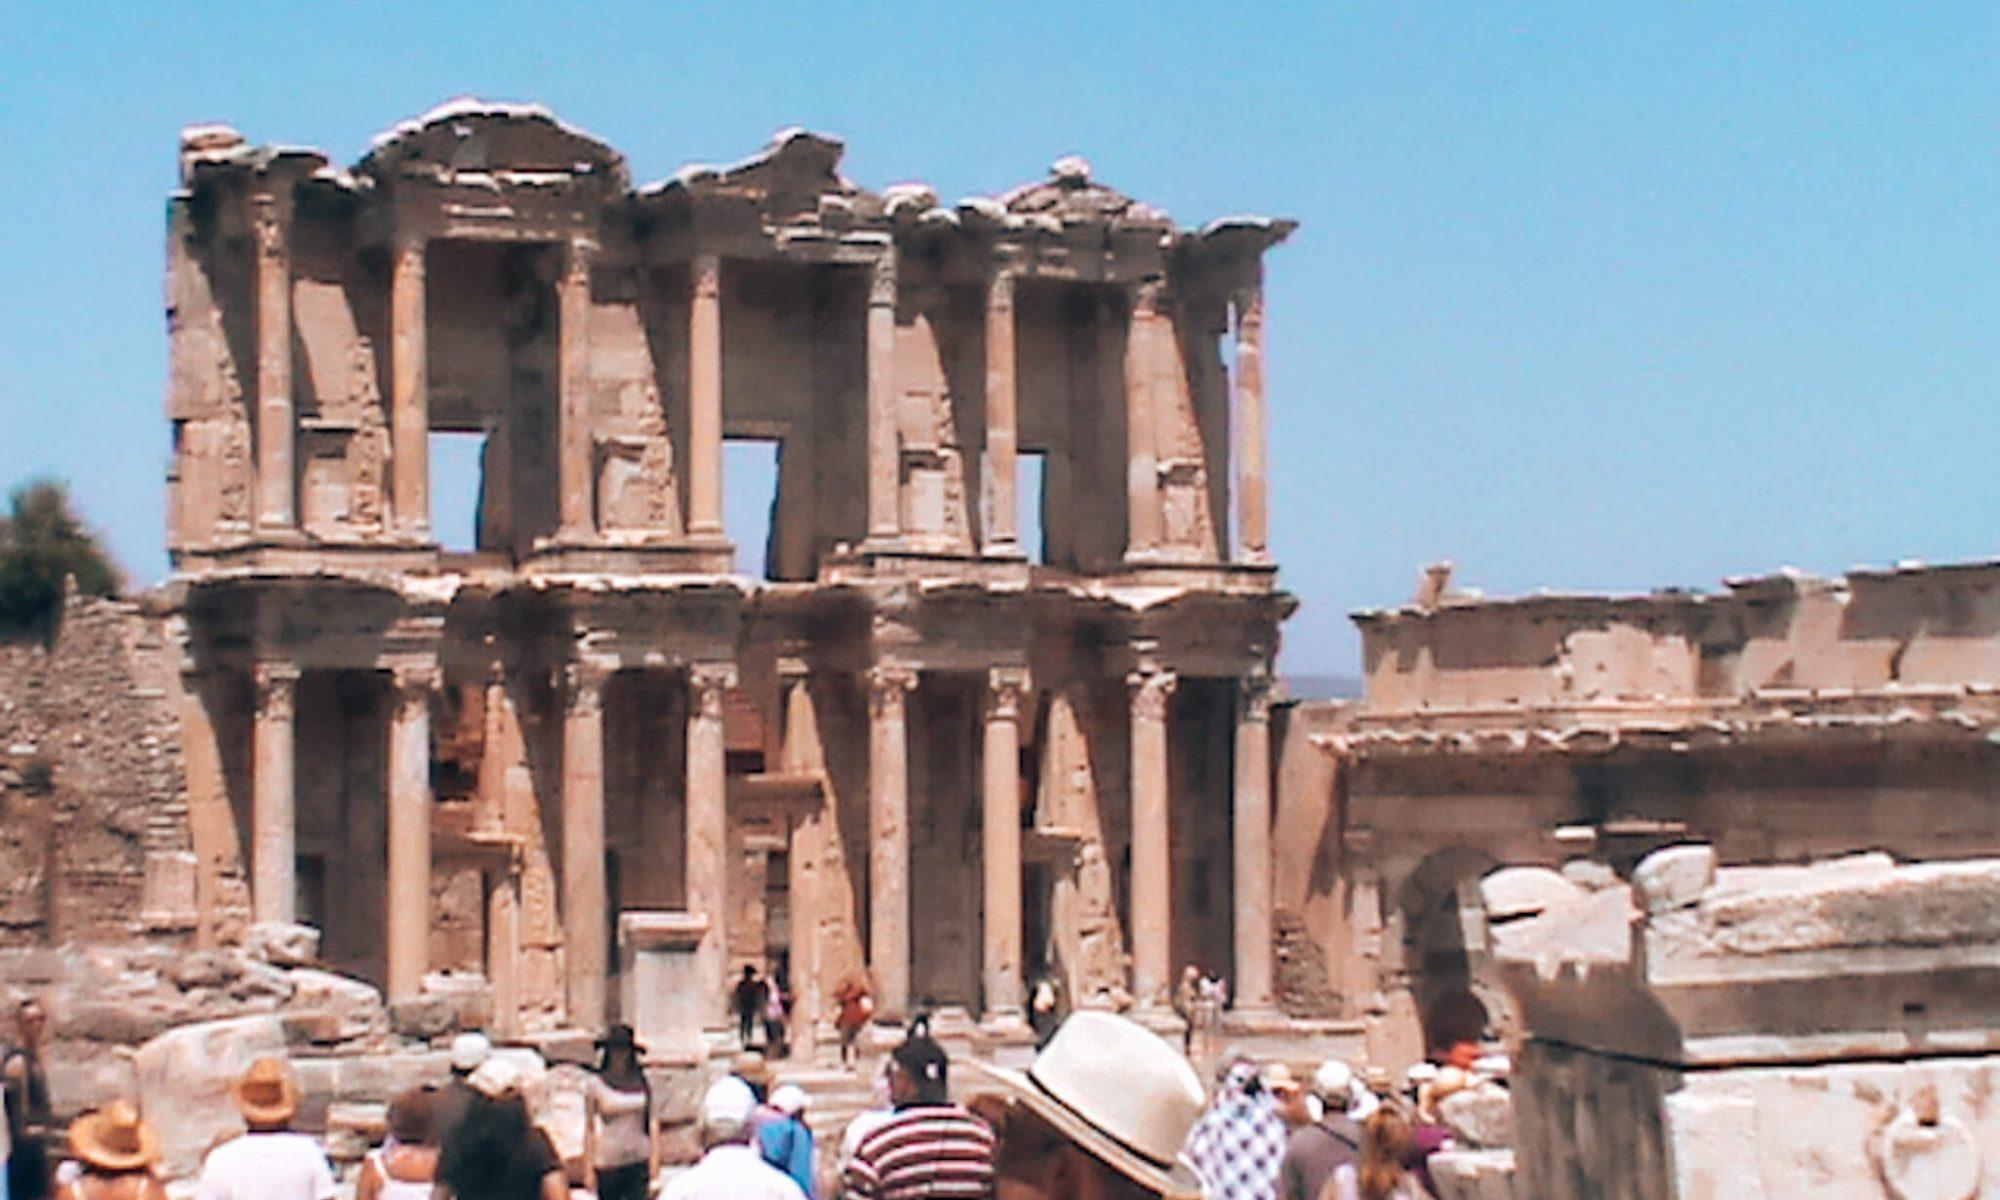 Templo de Ártemis em Éfeso, Turquia © lavidaesmara